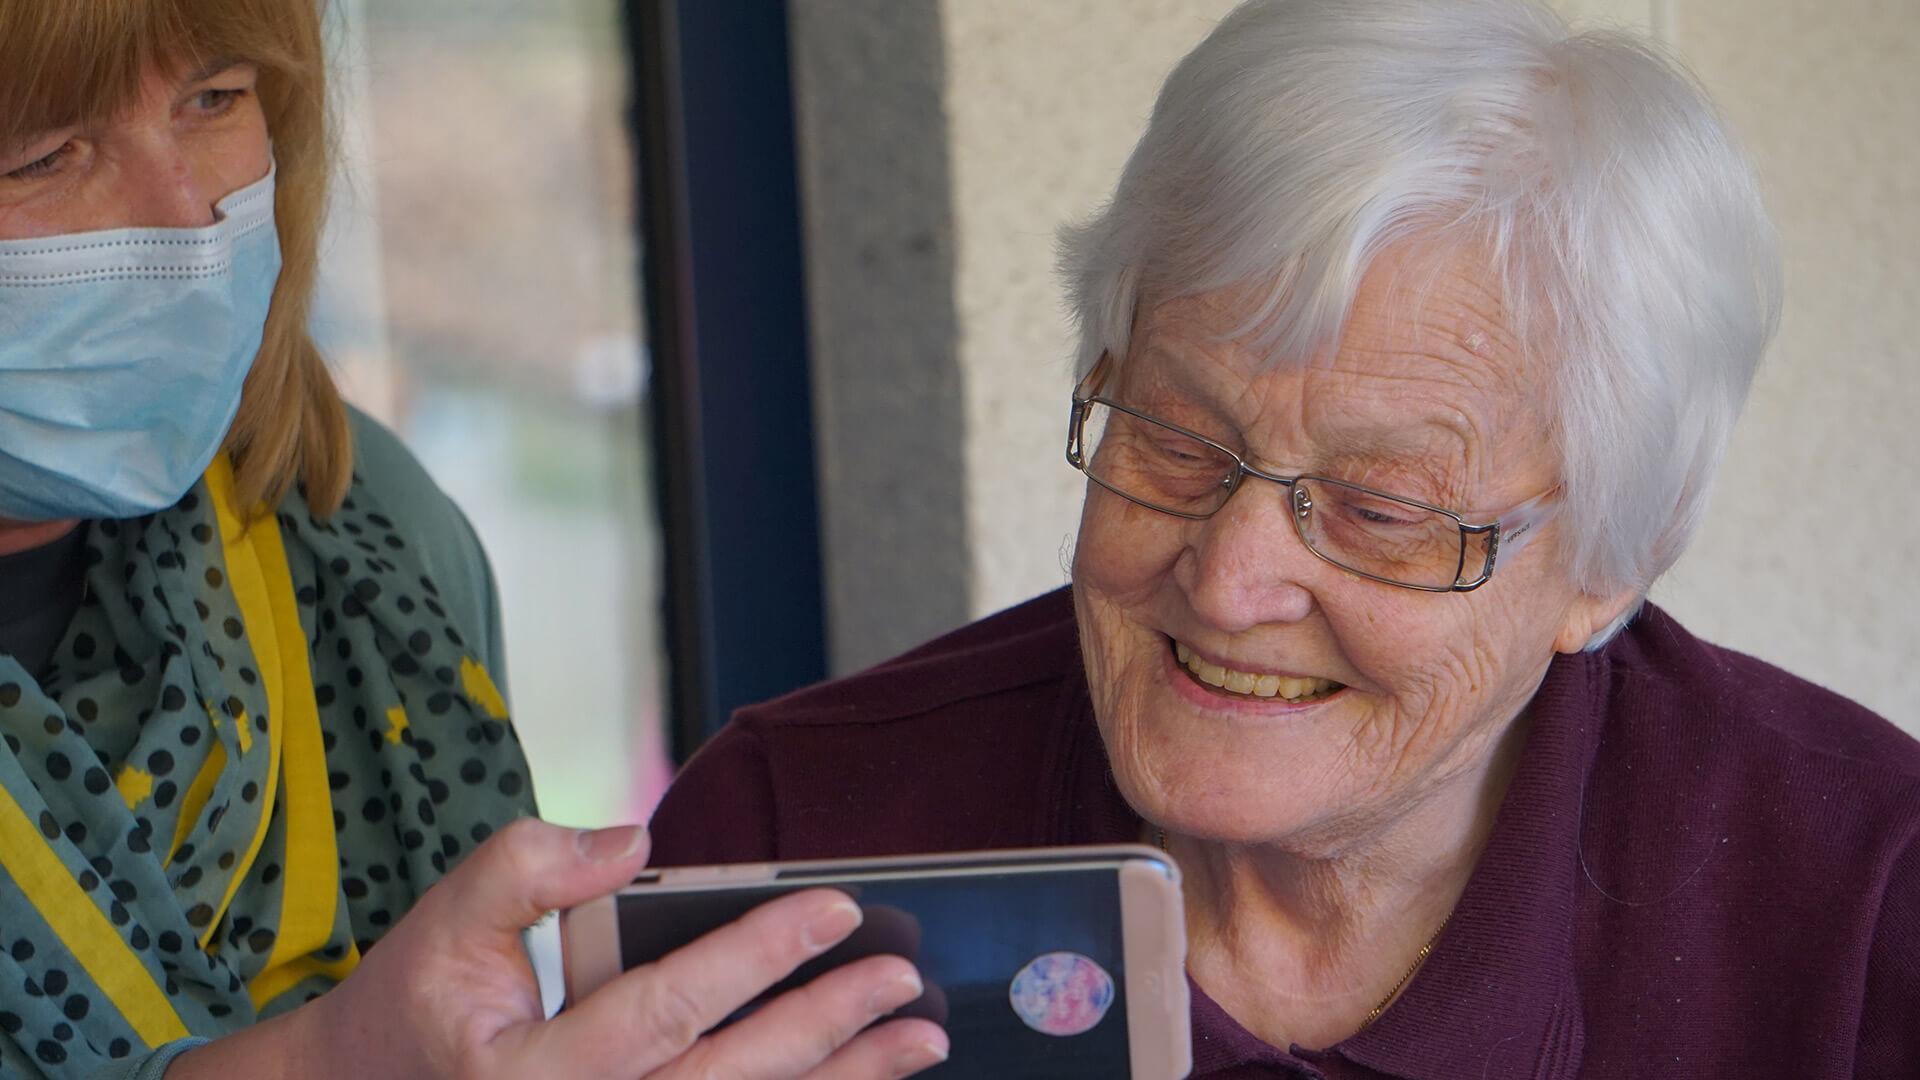 Senhora a mostrar telemóvel a senhora idosa sorridente